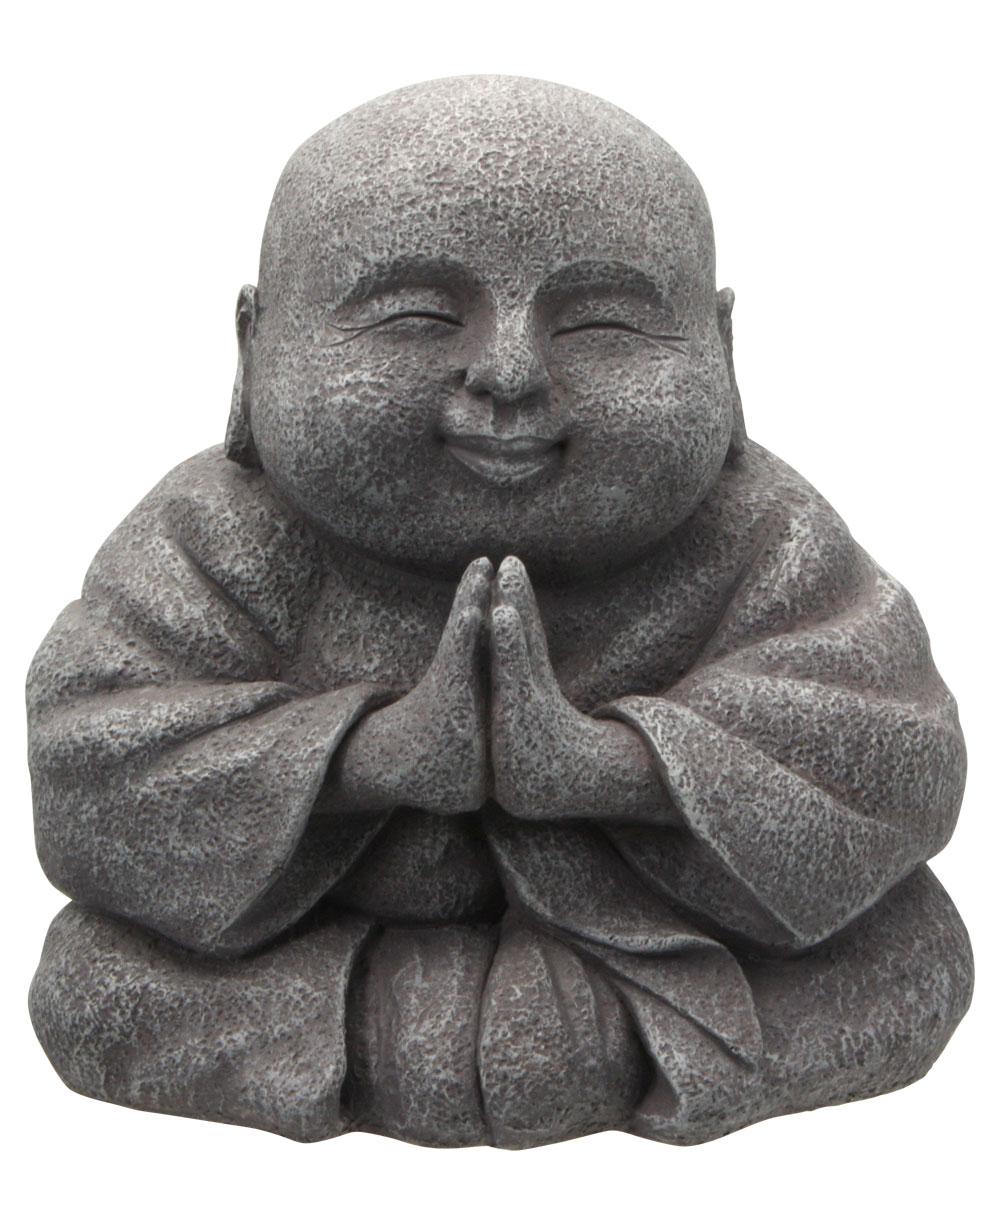 Buddha Statues For The Garden: Buddha Groove Adds Zen Garden Statue Collection